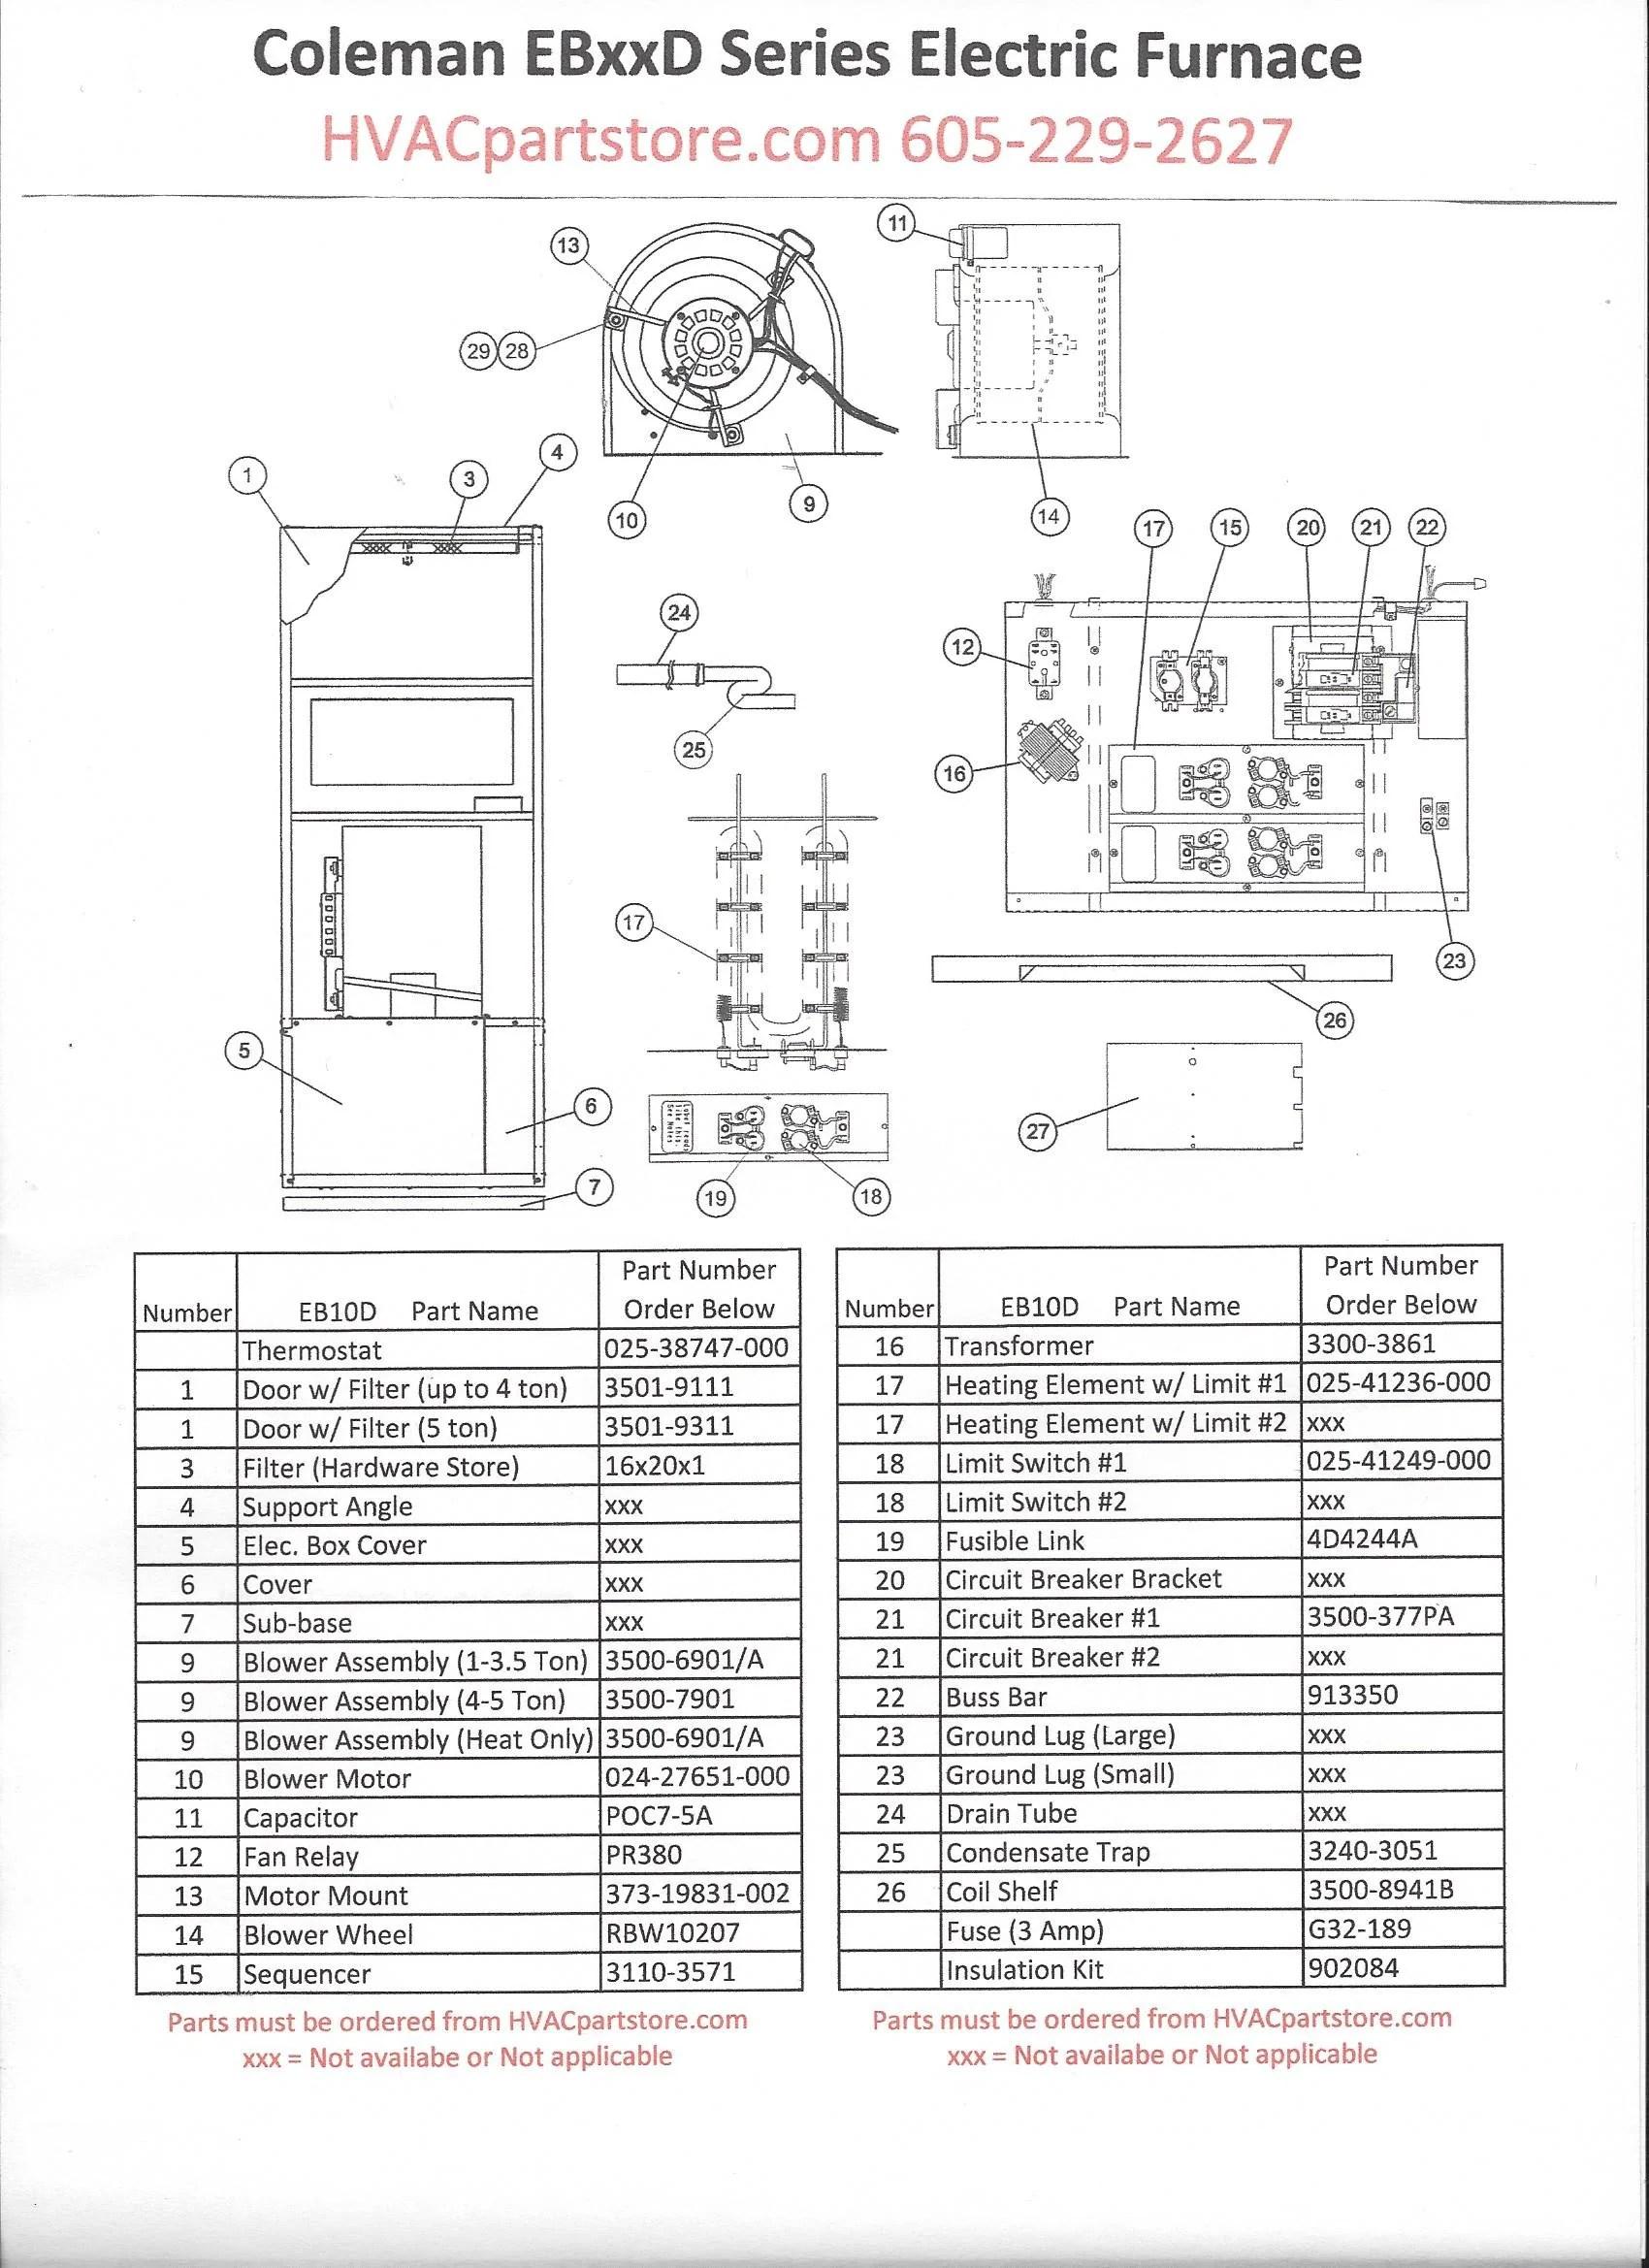 EB10D Coleman Electric Furnace Parts – HVACpartstore